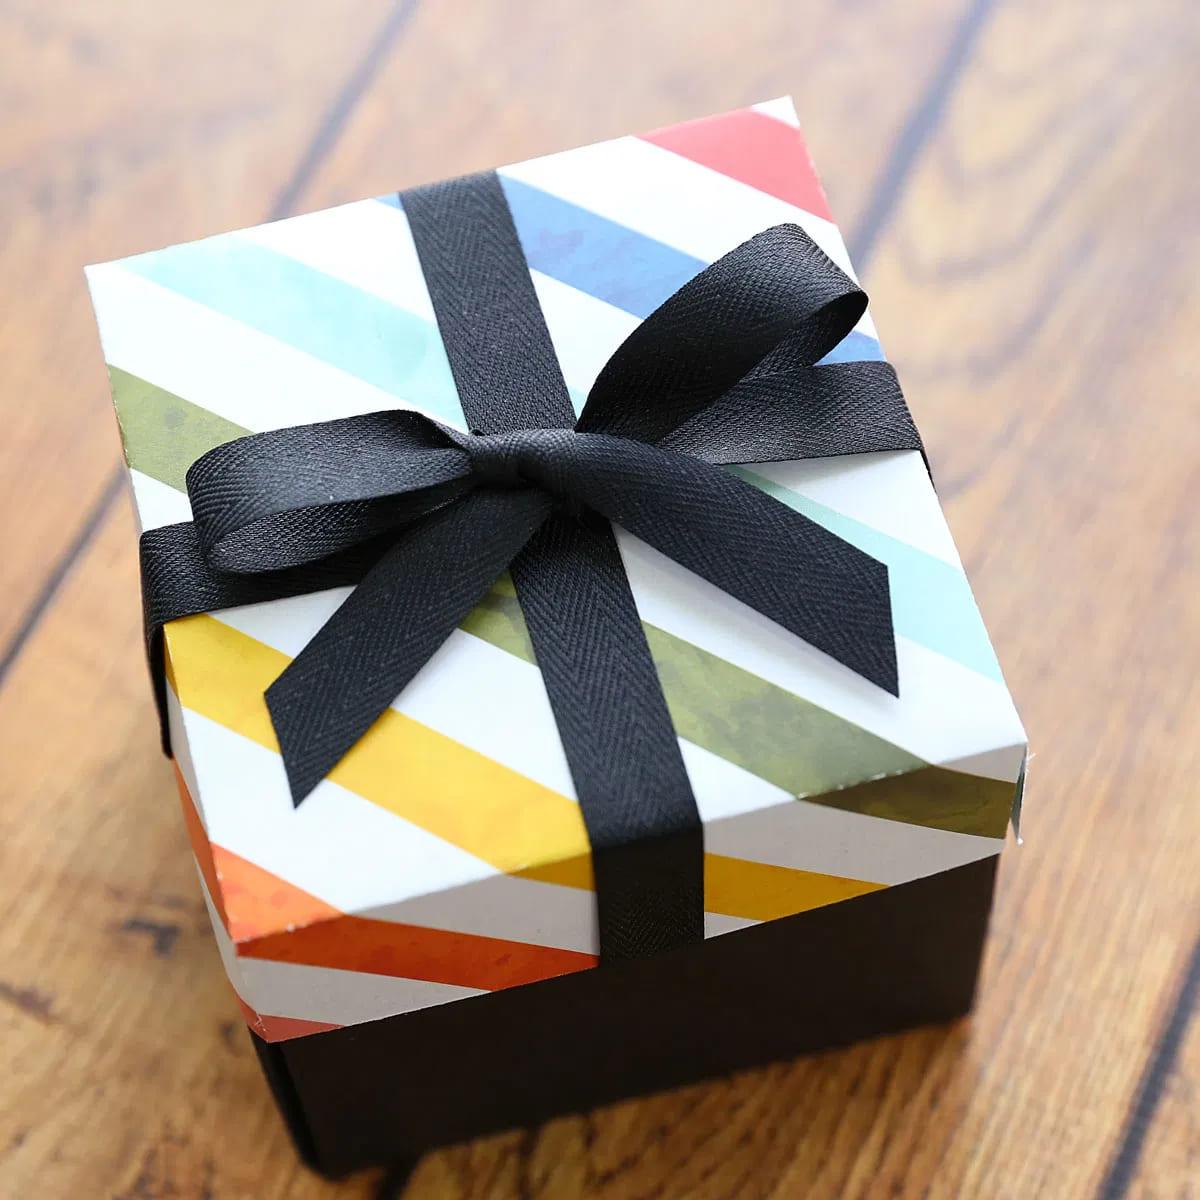 regali-natale-da-spedire-posta-6